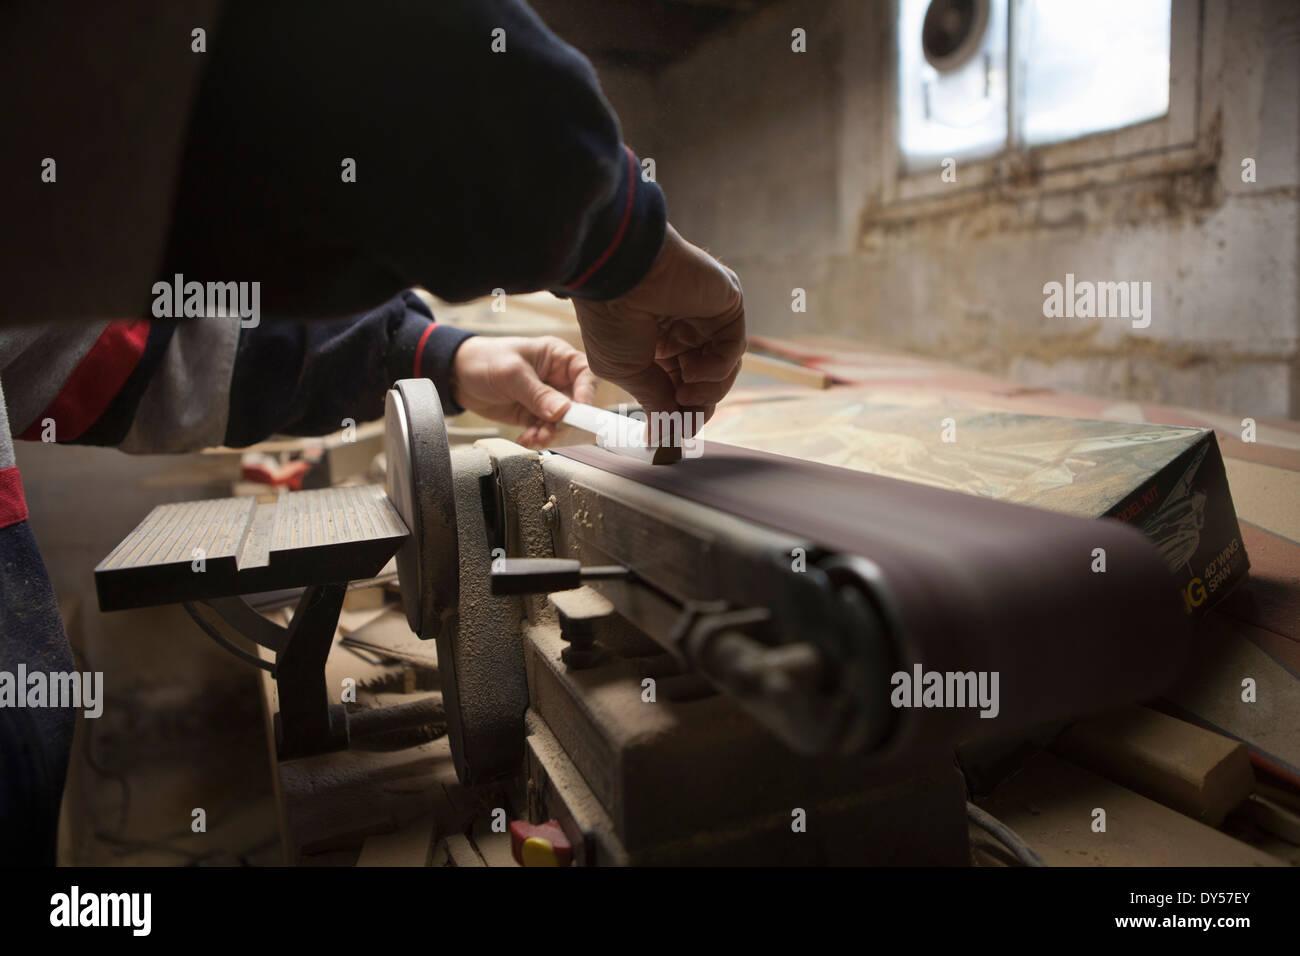 Close up of mature man using sanding belt in workshop - Stock Image